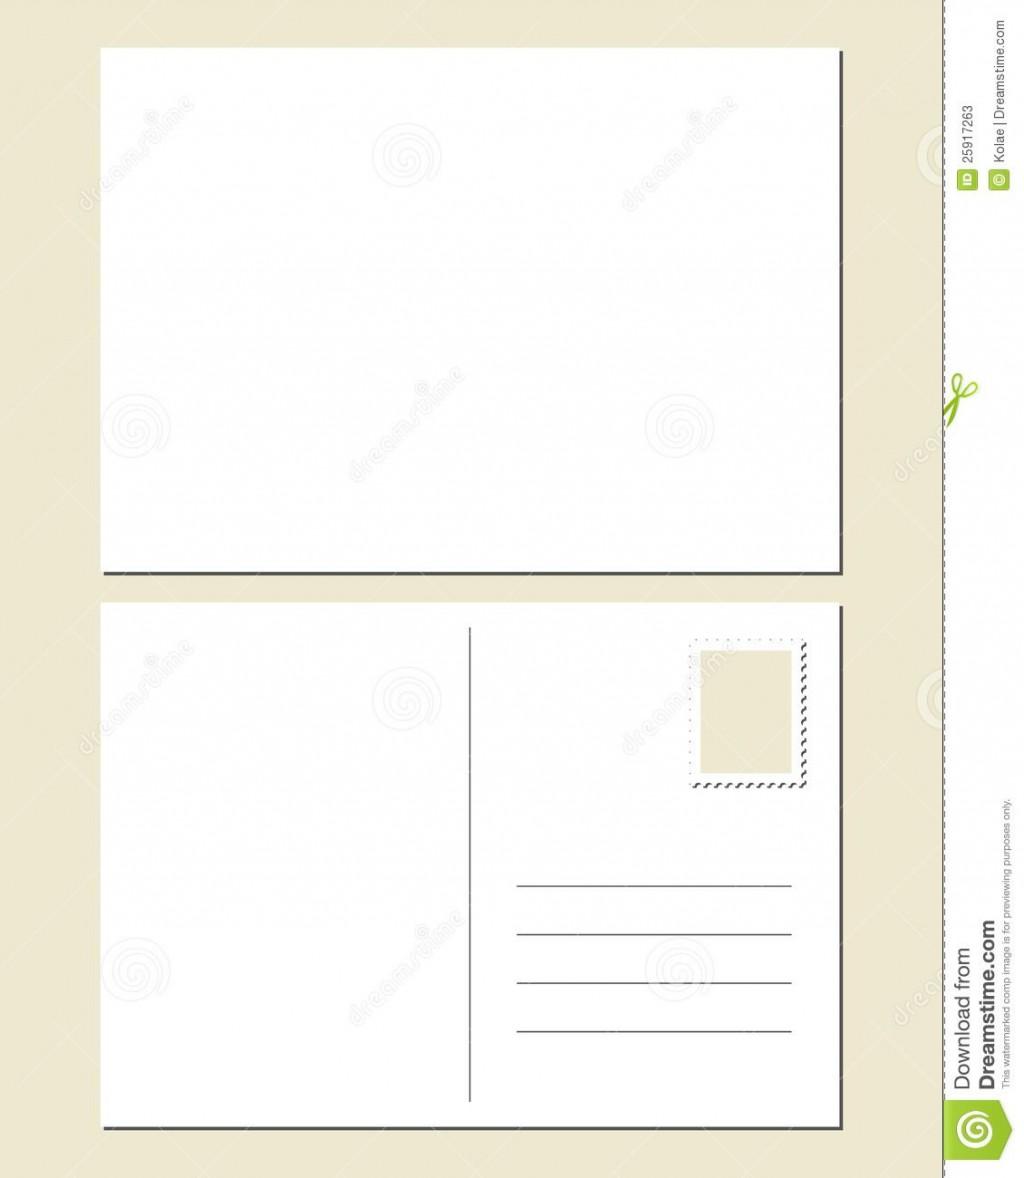 006 Impressive Postcard Template Front And Back Highest Quality  Free WordLarge